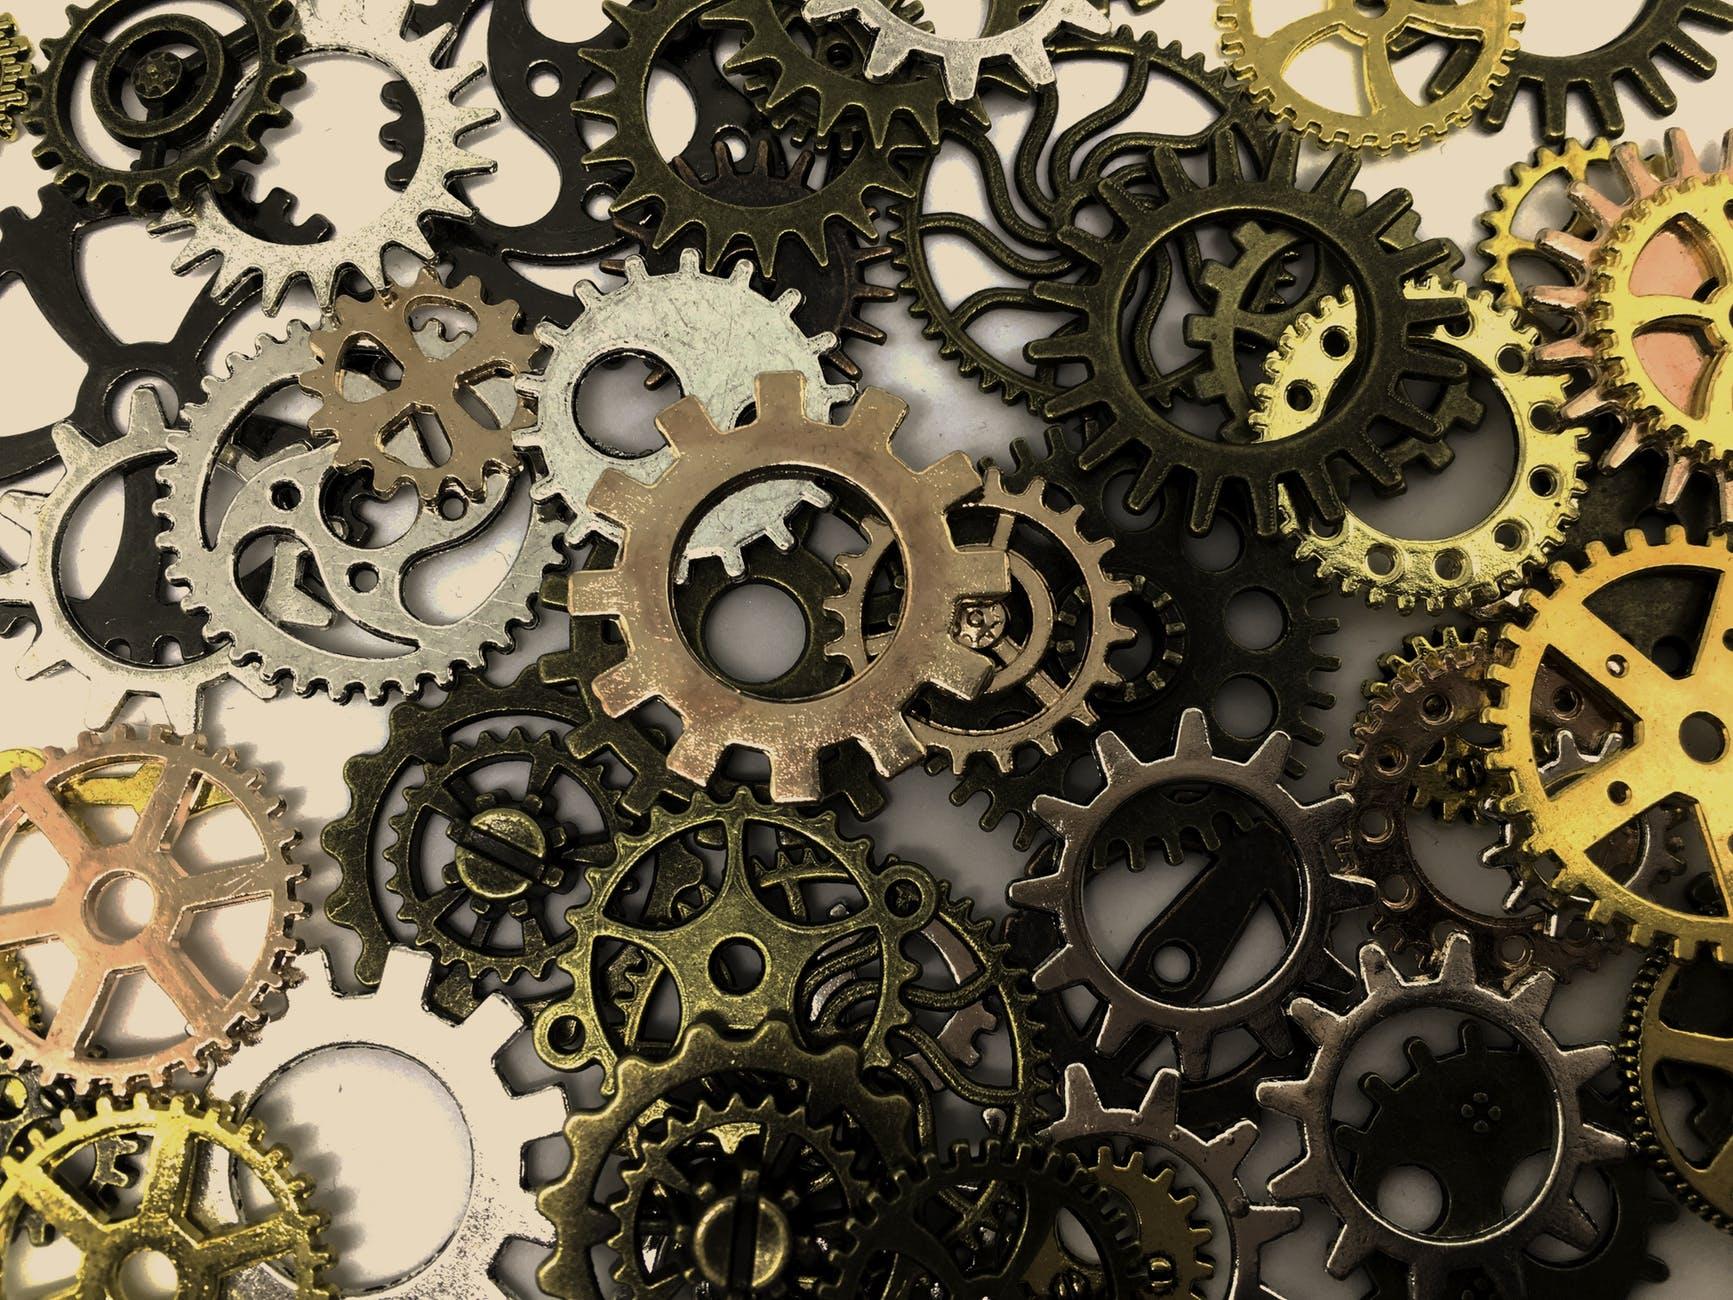 B.tech Mechanical Engineering